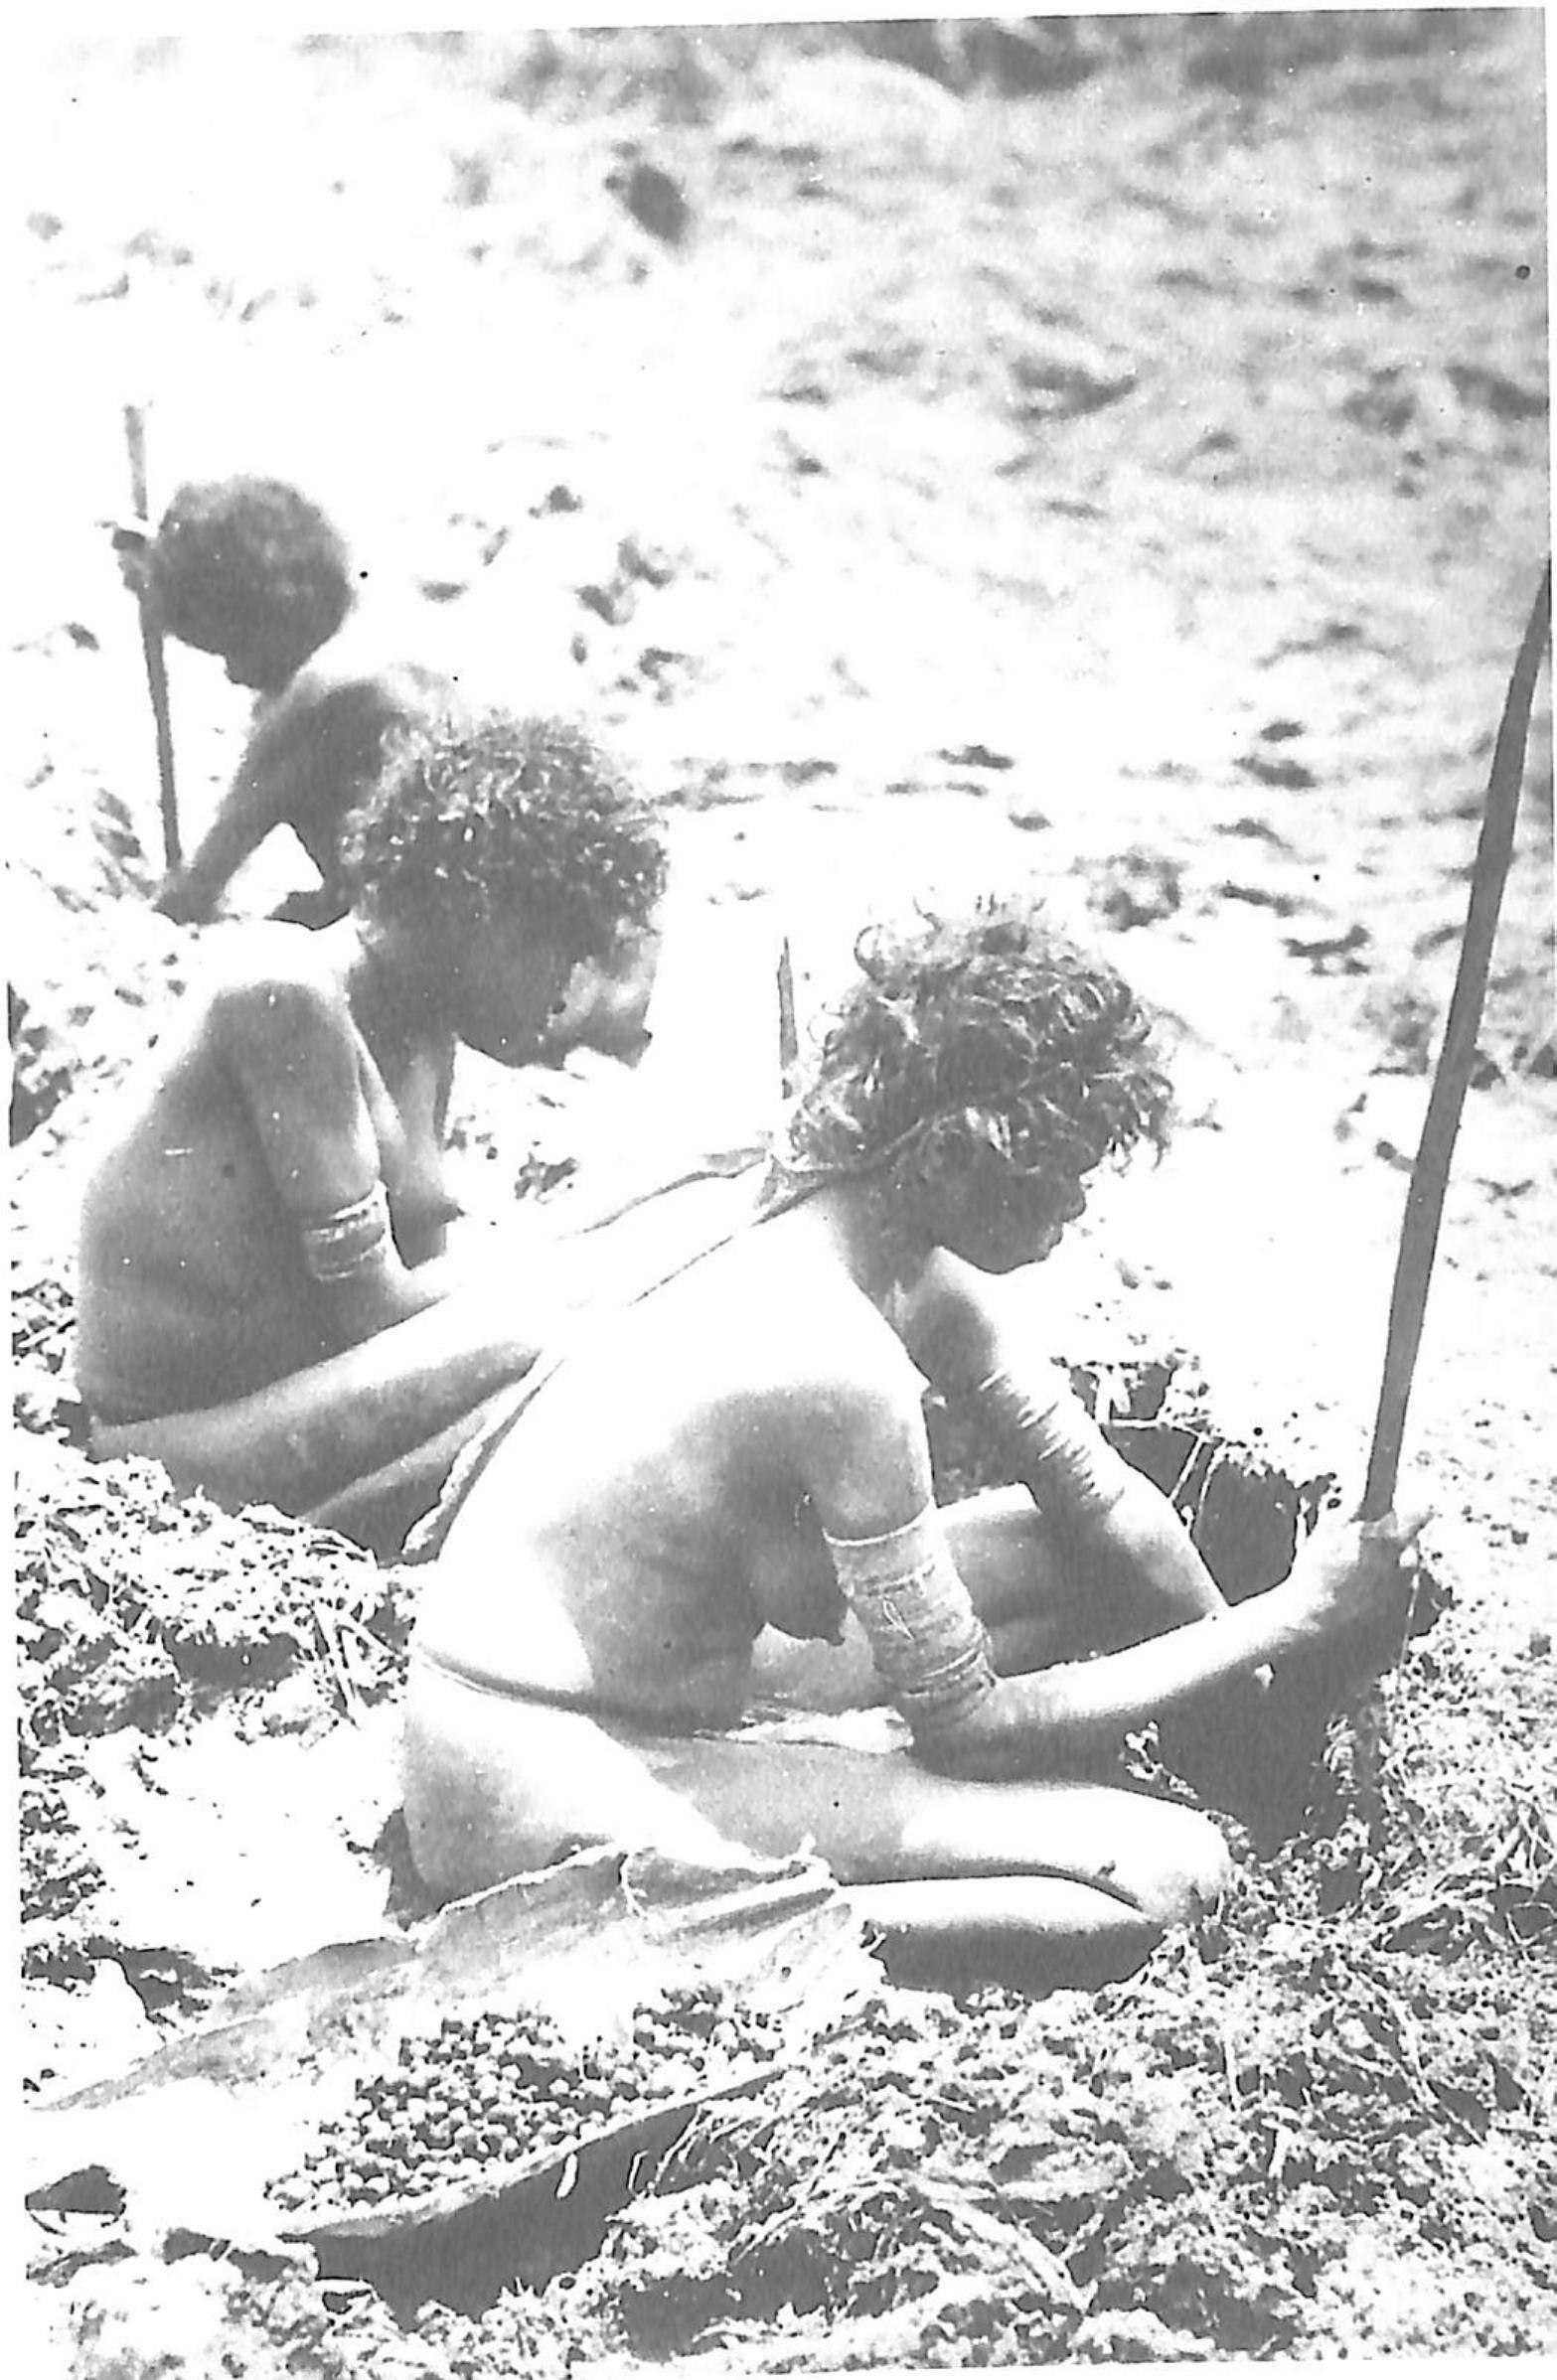 "- ""Pre-contact Aboriginal Australia is often seen as a paradigm of a hunter-gatherer culture"".Prof Amos Rapoport, Distinguished Professor Emeritus, Dept. of Architecture, University of Wisconsin Milwaukee, in Memmott, P., Gunyah Goondie + Wurley, QUP, 2007, Preface."